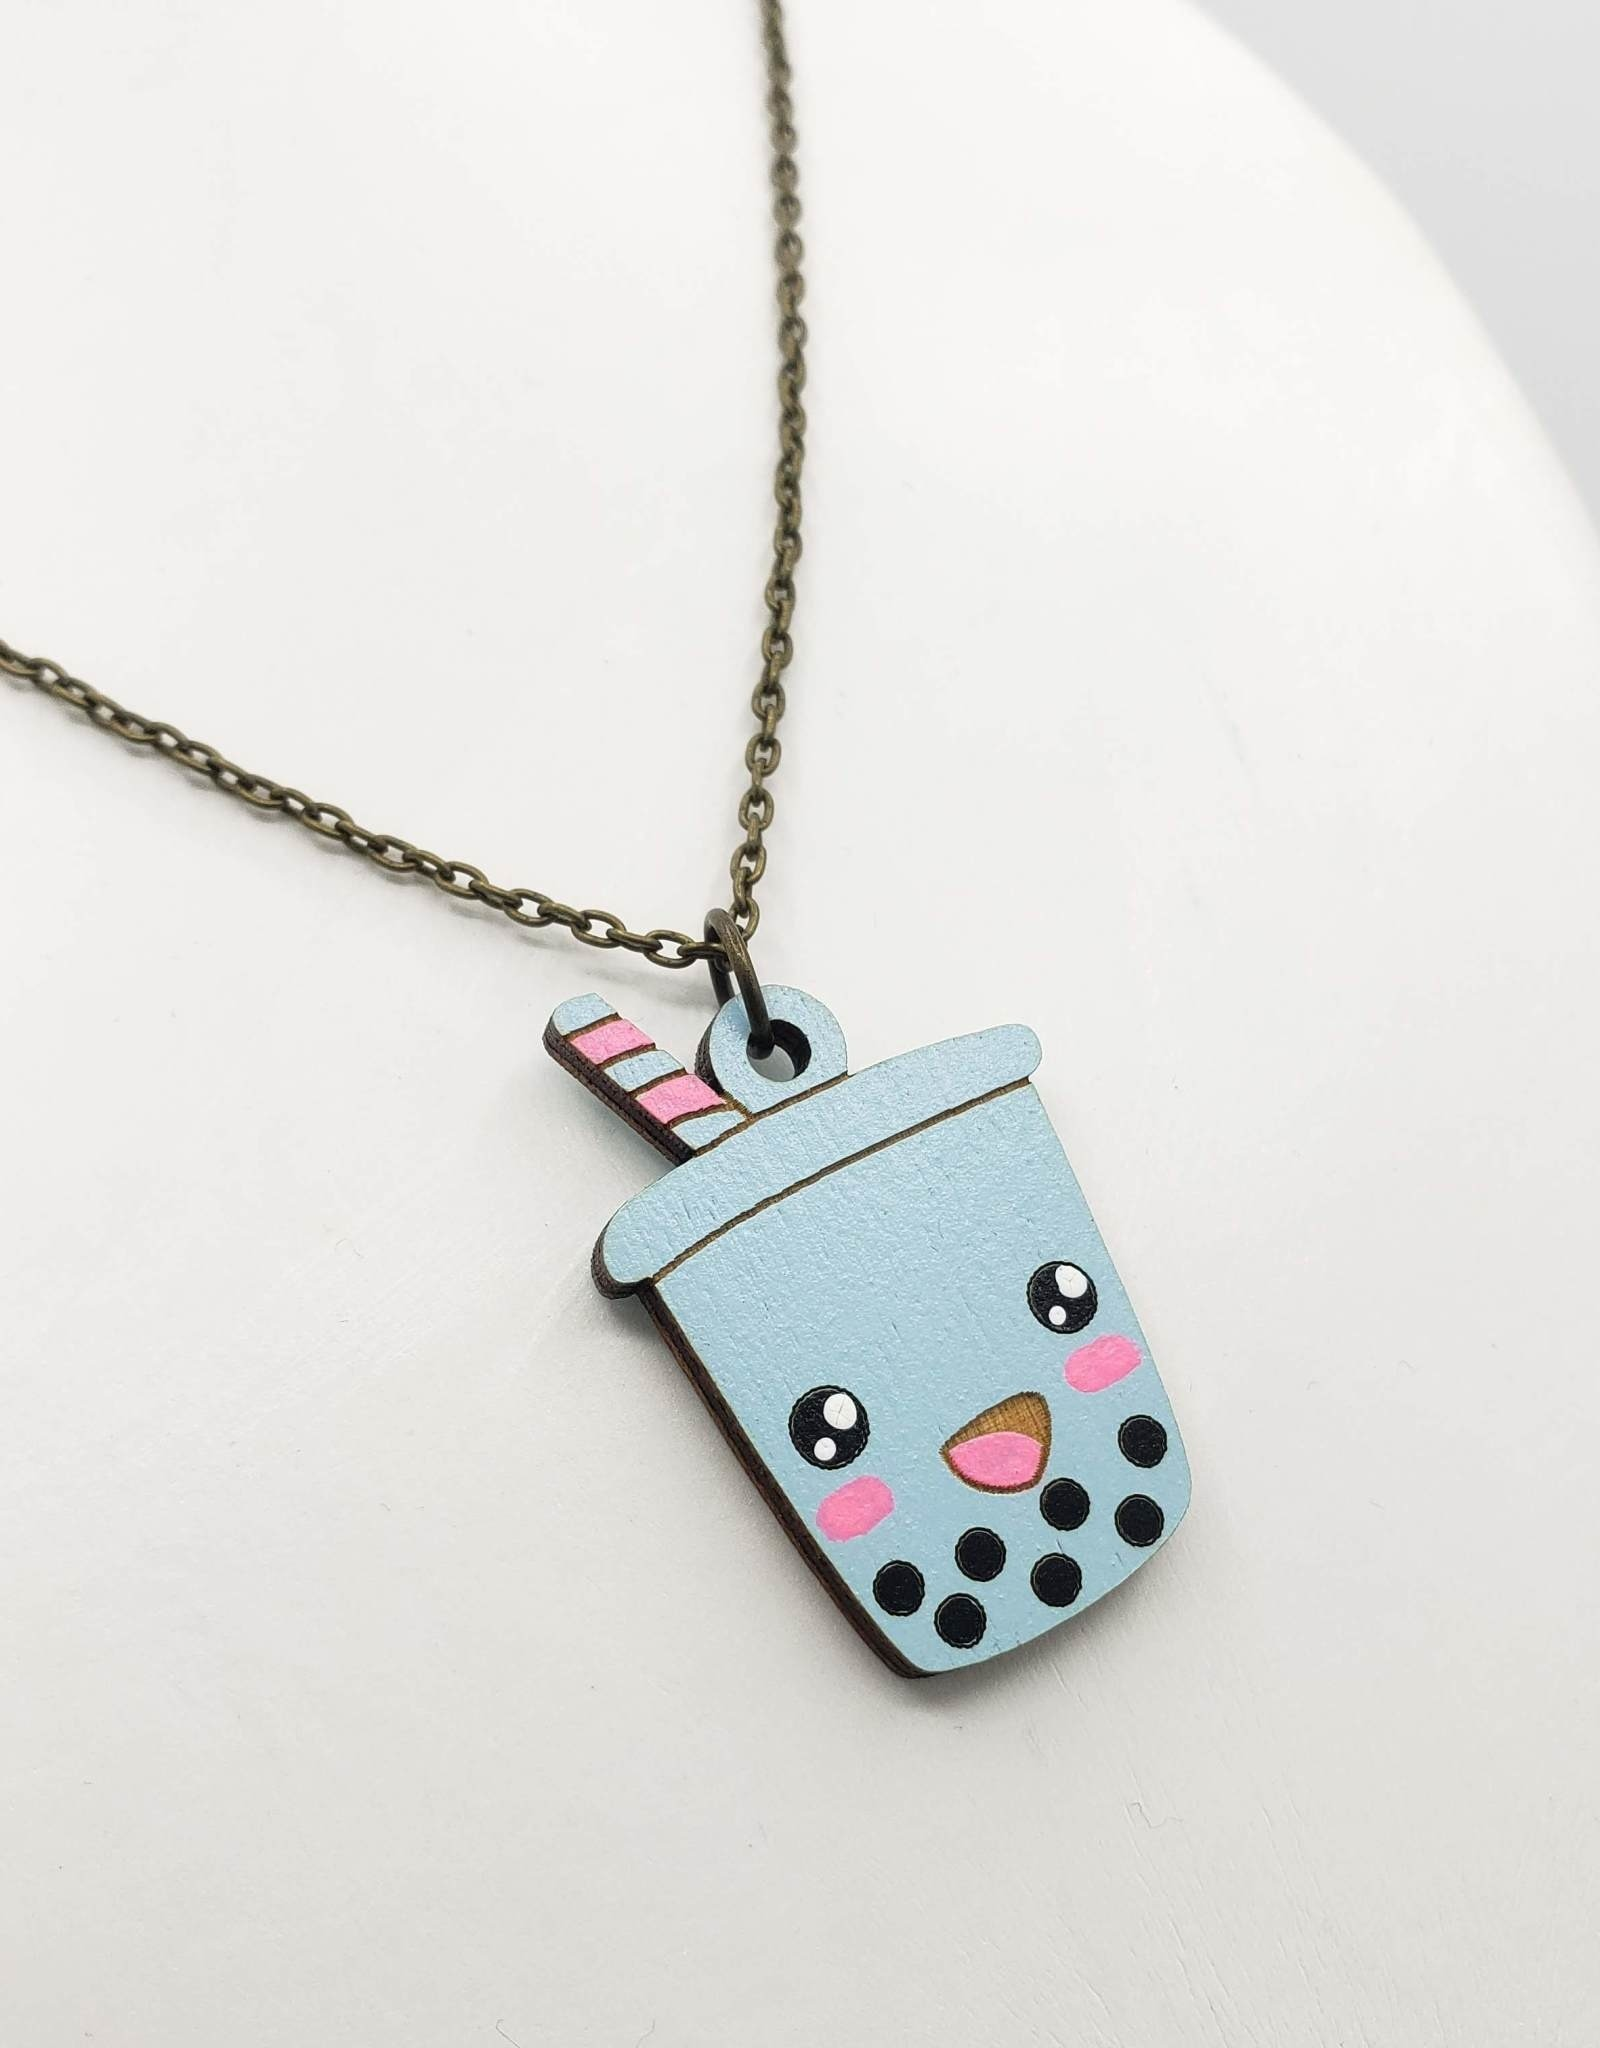 Bubble Tea Necklace - Unpossible Cuts